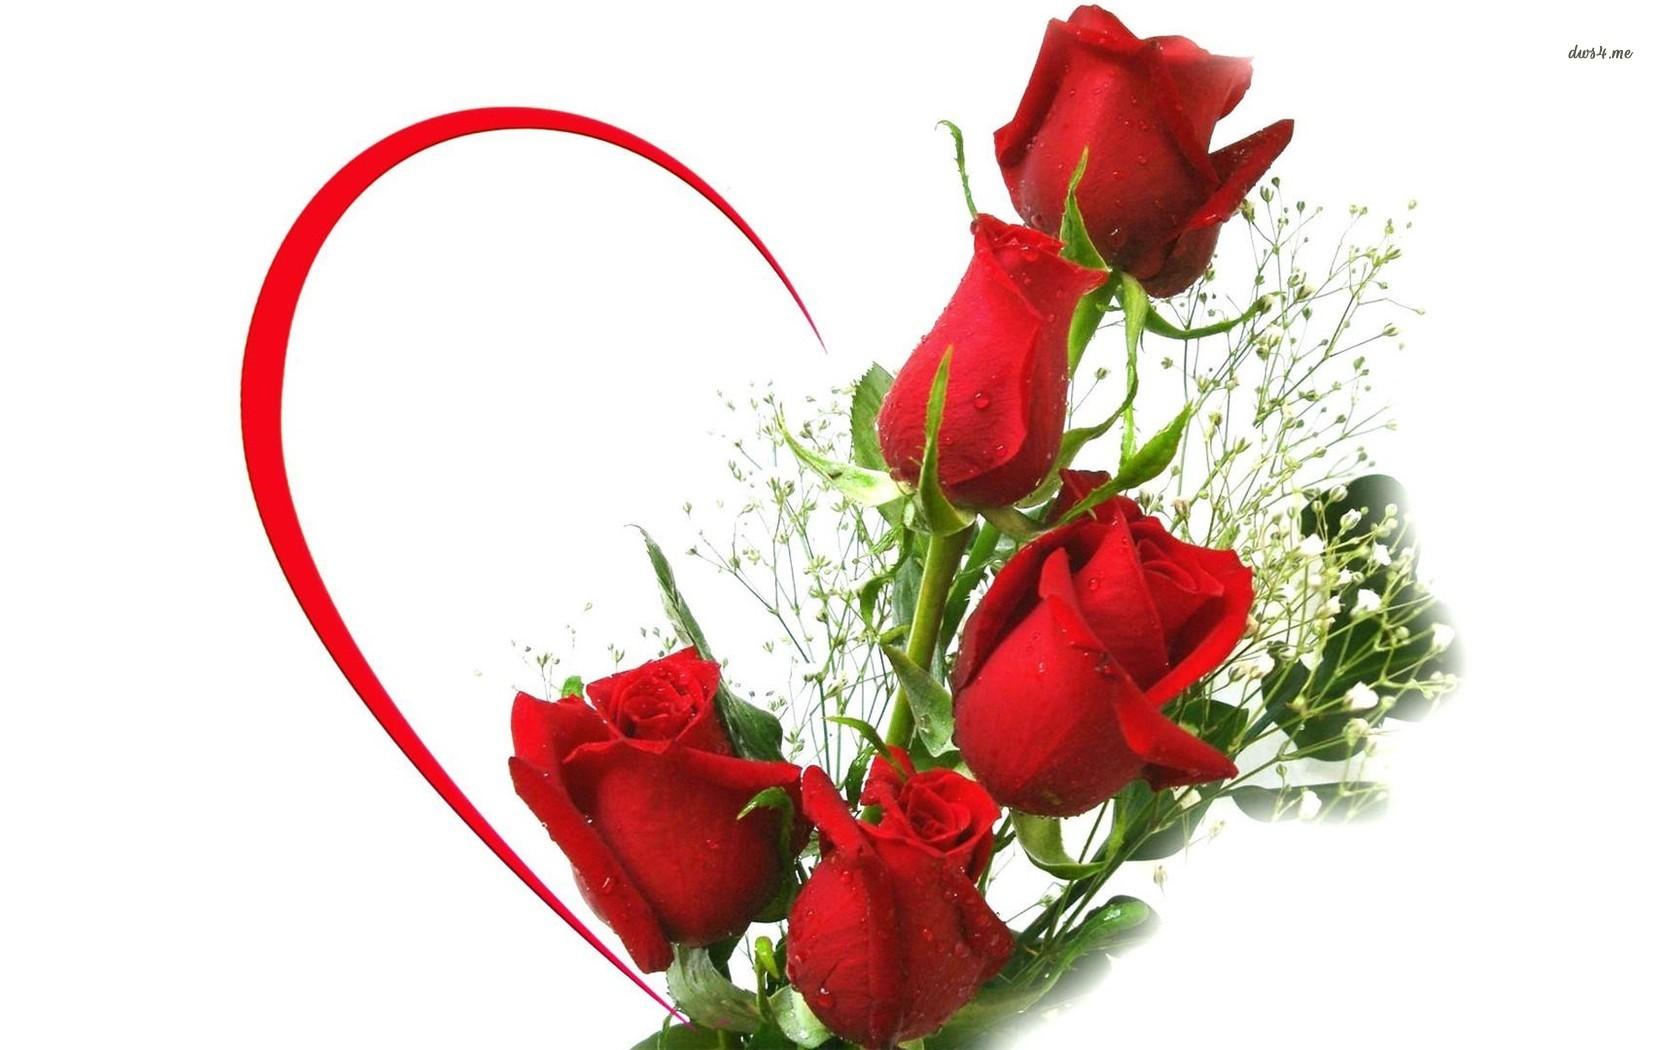 ... Red rose bouquet wallpaper 1680x1050 ...